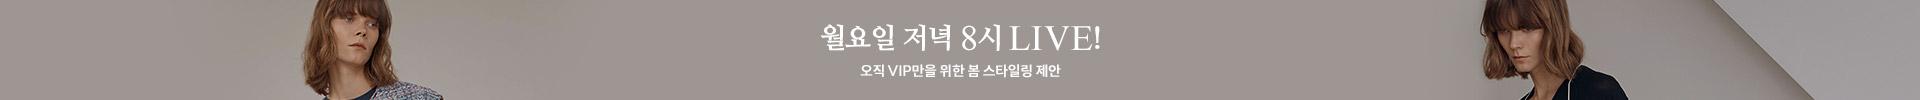 SI.LIVE 방송전_ 델라라나 VIP 스타일링 클래스